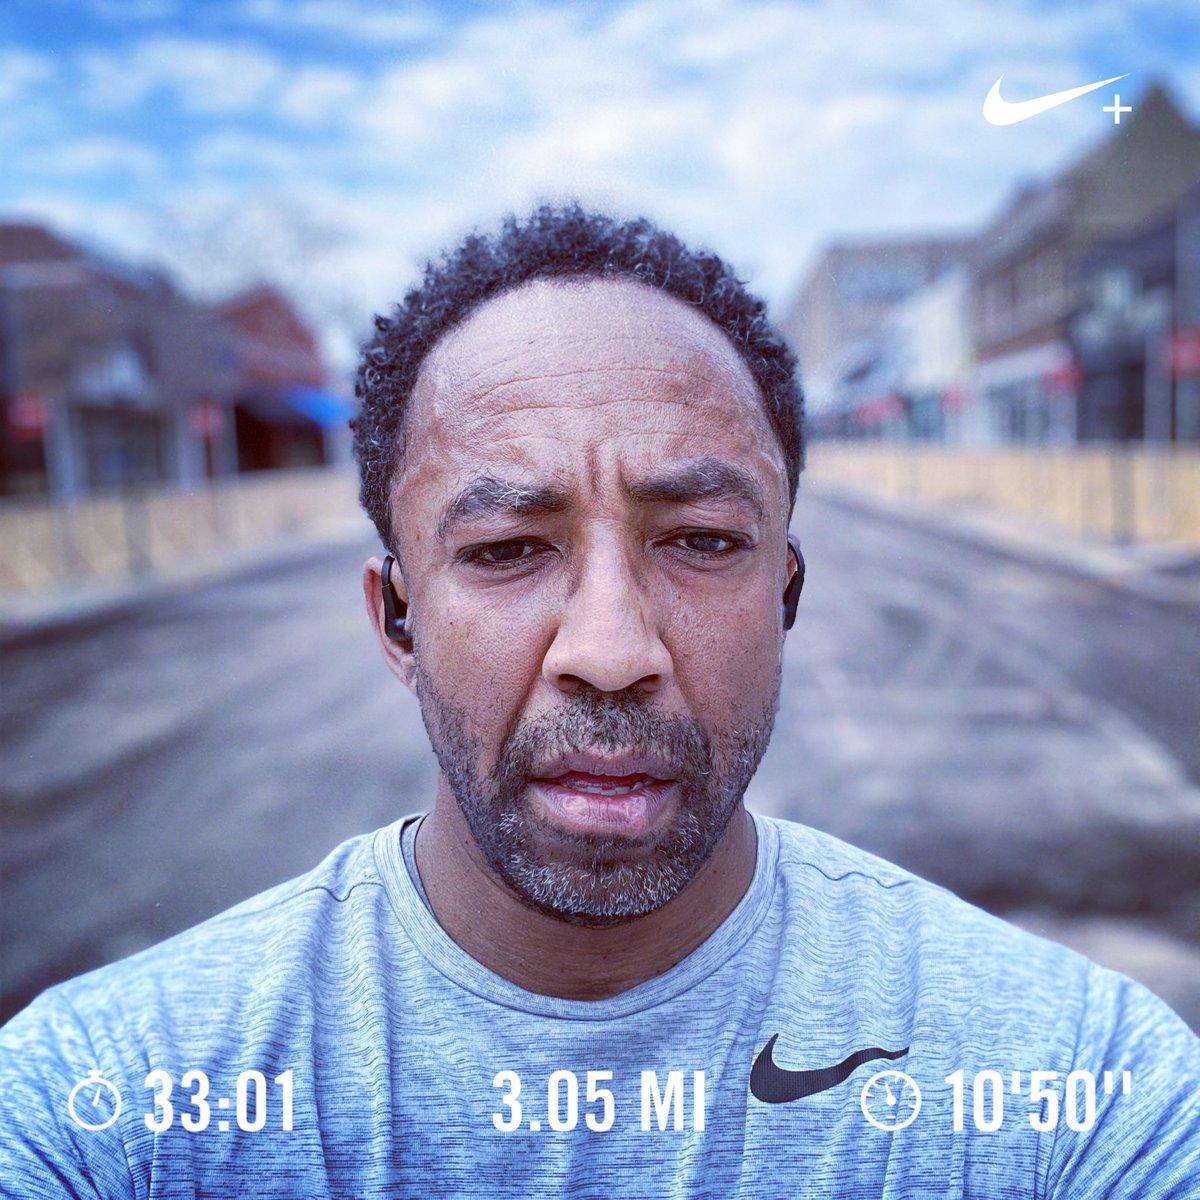 Started my #halfmarathontraining today for the @freepmarathon and did a 3 mile run. #hopewaterproject #freepmarathon #nikerun<br>http://pic.twitter.com/jyudUnstgP